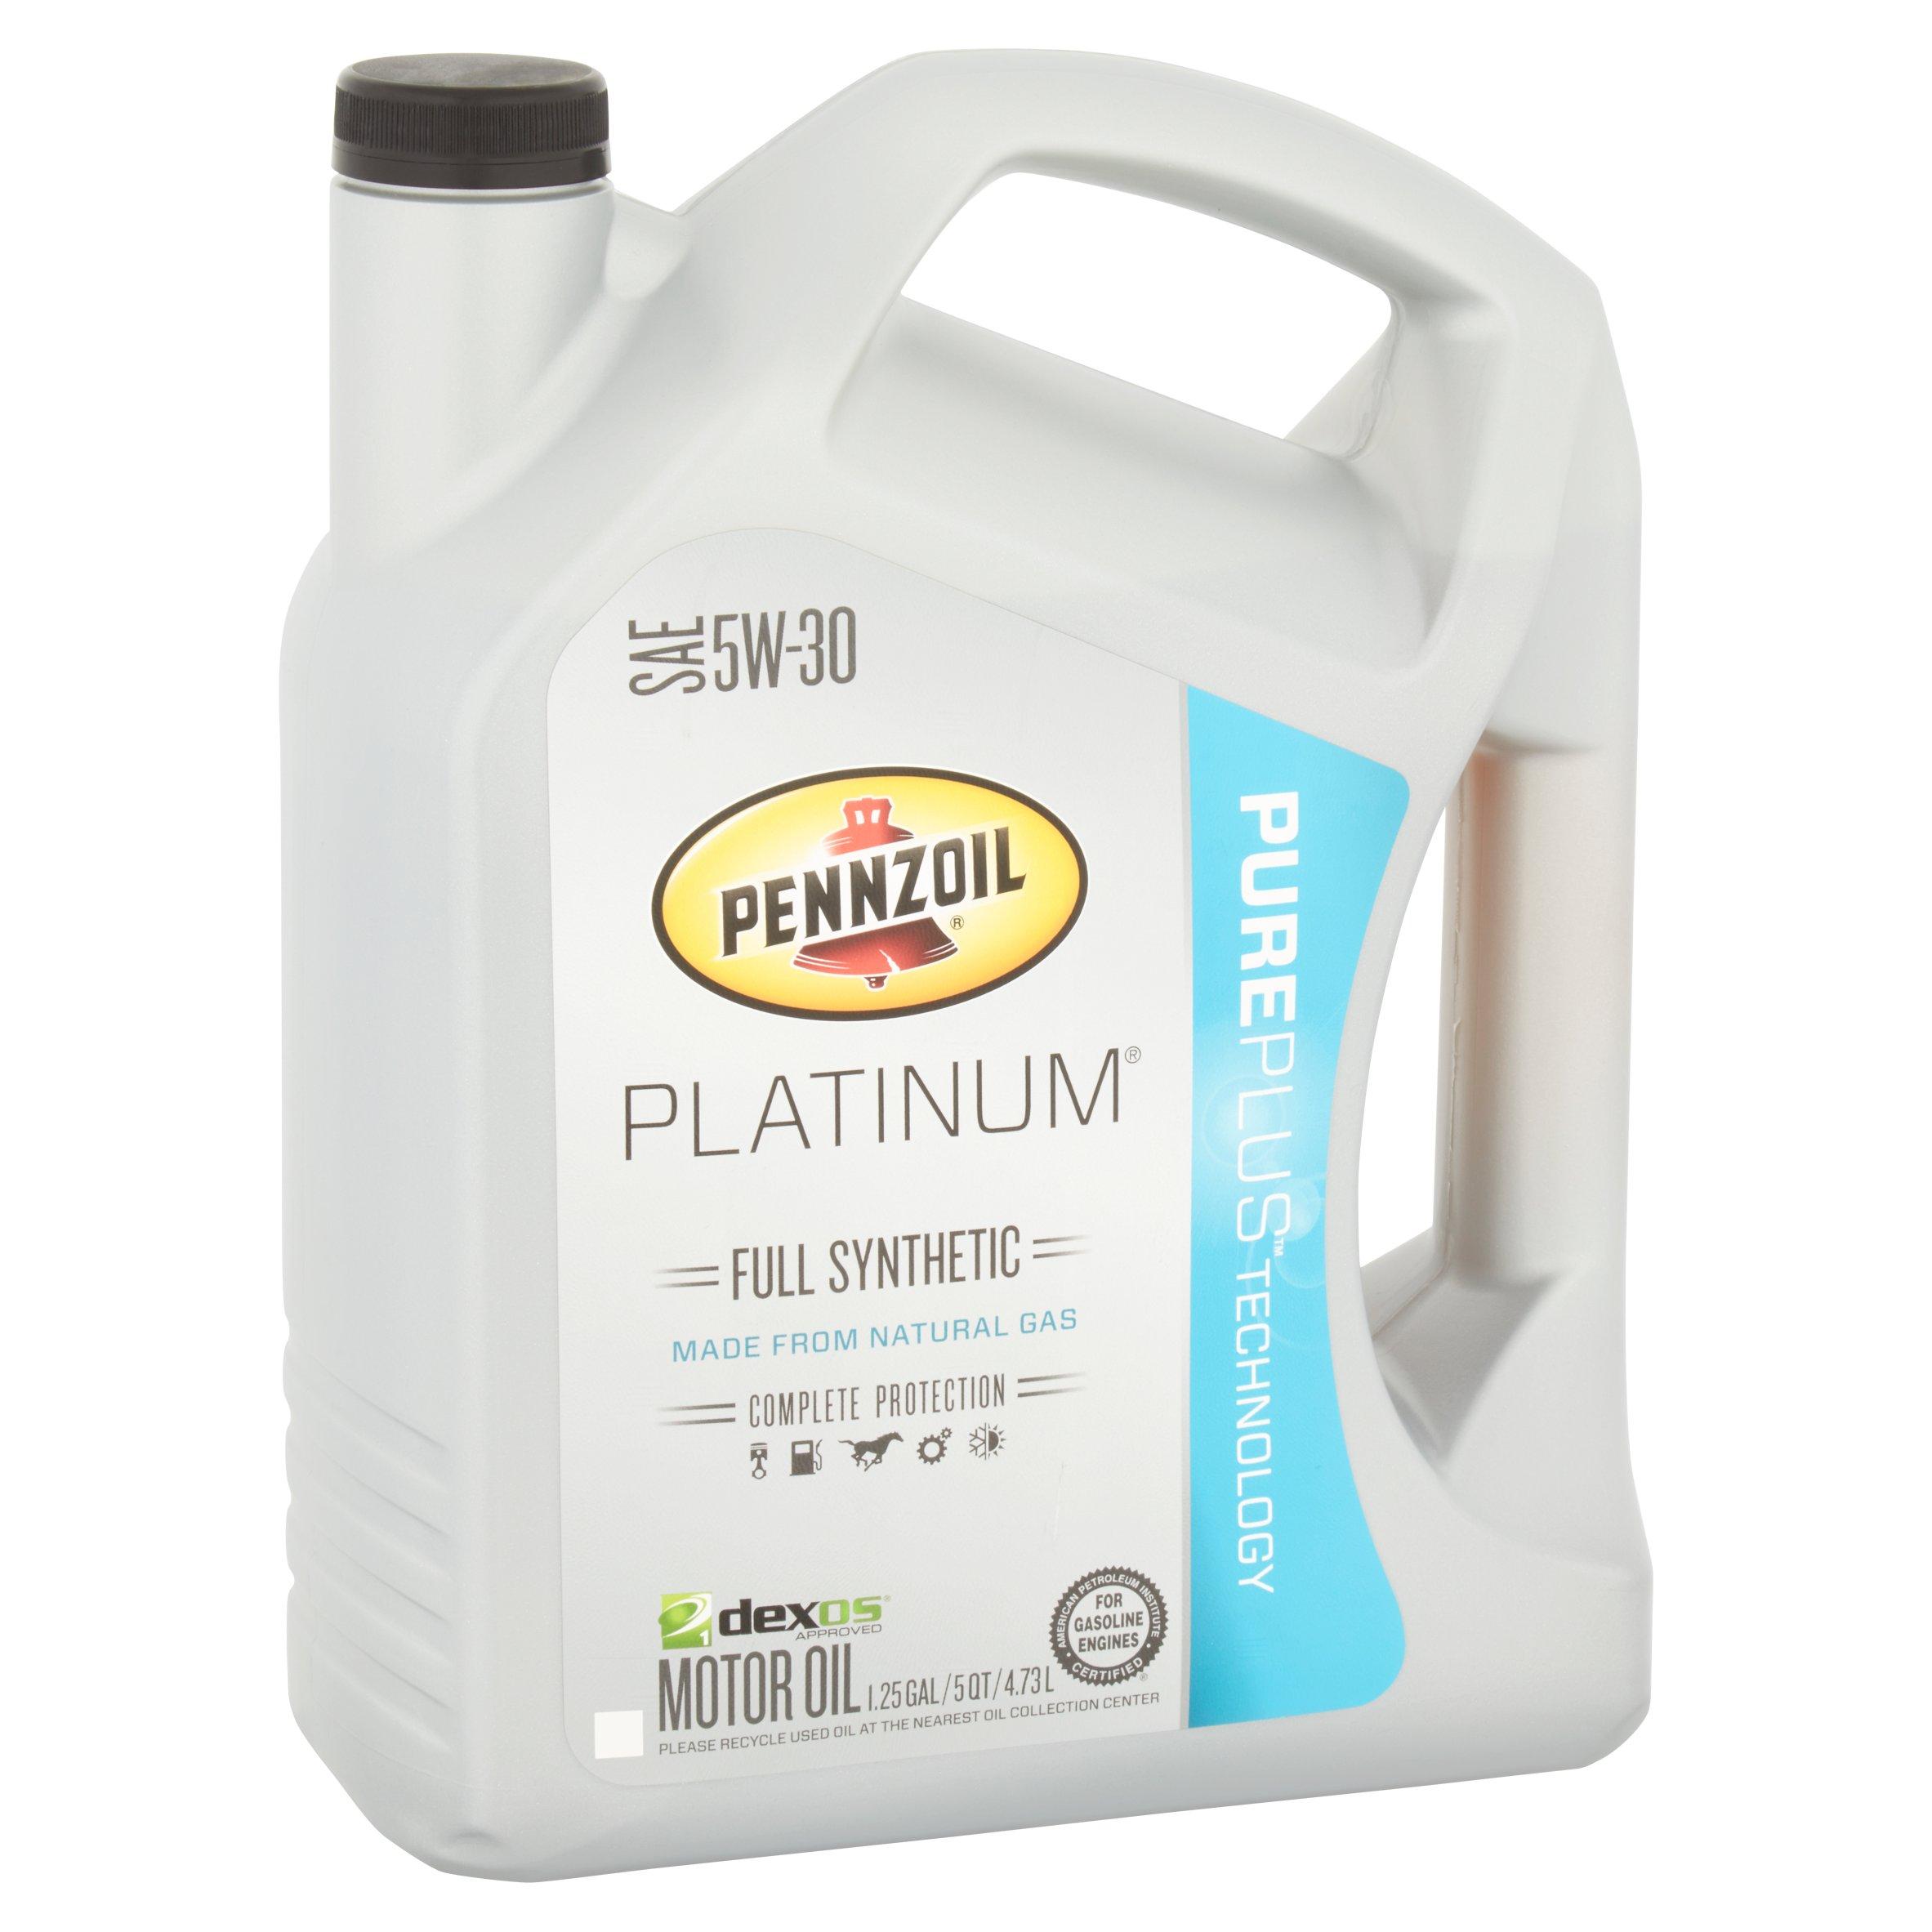 Pennzoil Platinum SAE 5W-30 Full Synthetic